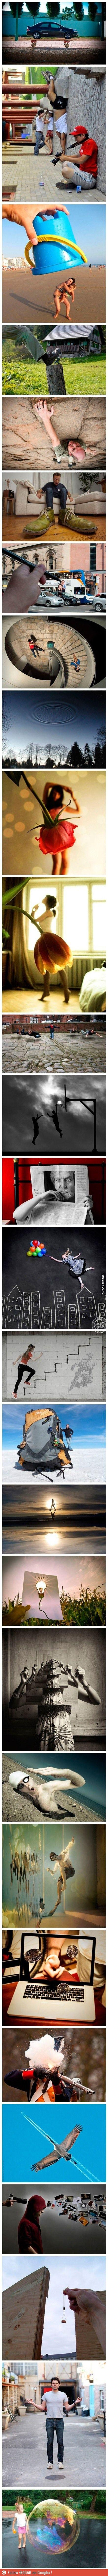 Perspektive - Perspective